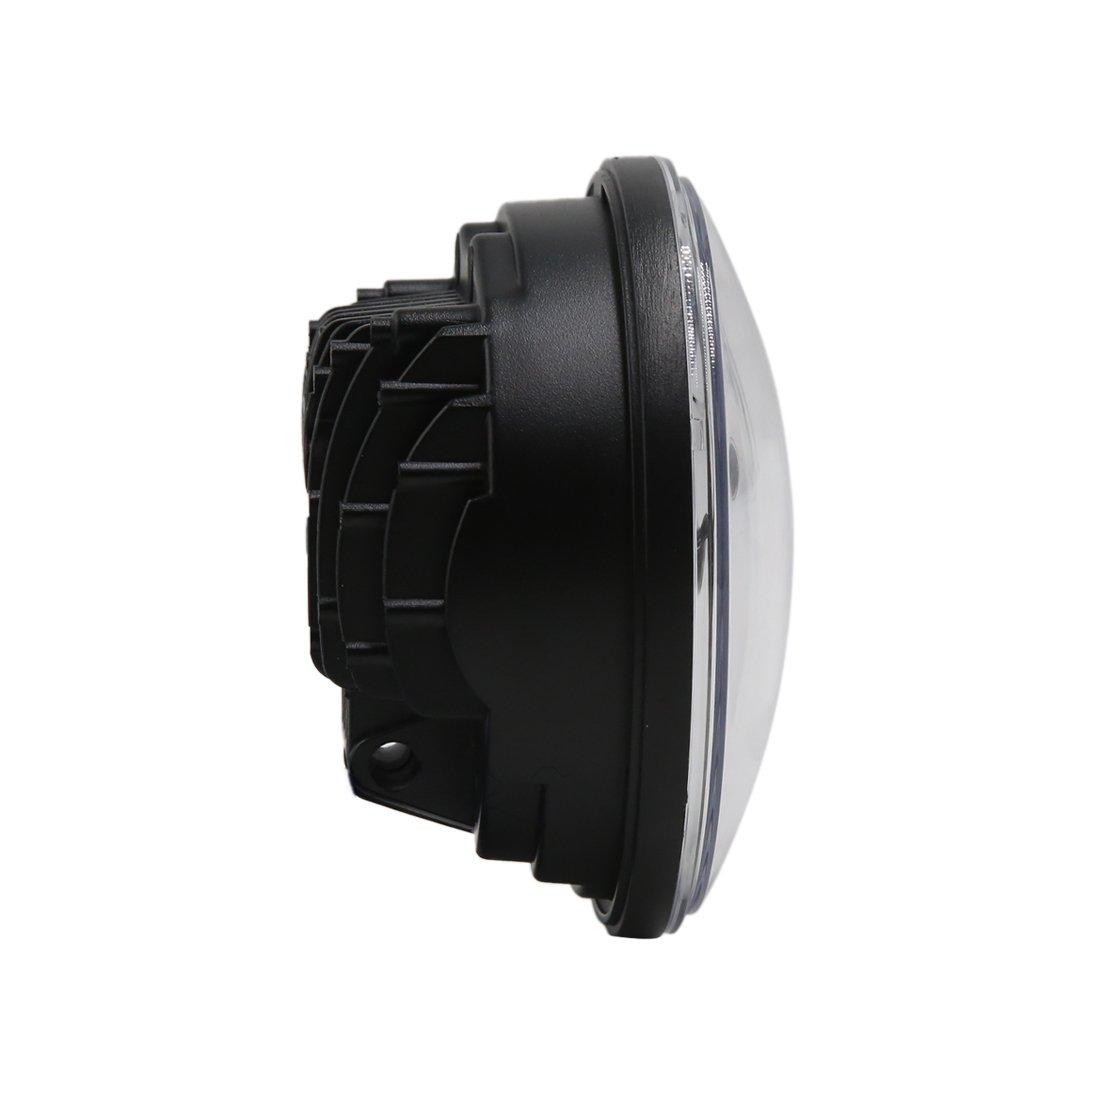 sourcingmap Noir 5.75 45W Moto Projecteur LED Ampoule Phare Phare pour Harley-Davidson Sportster Dyna Softail